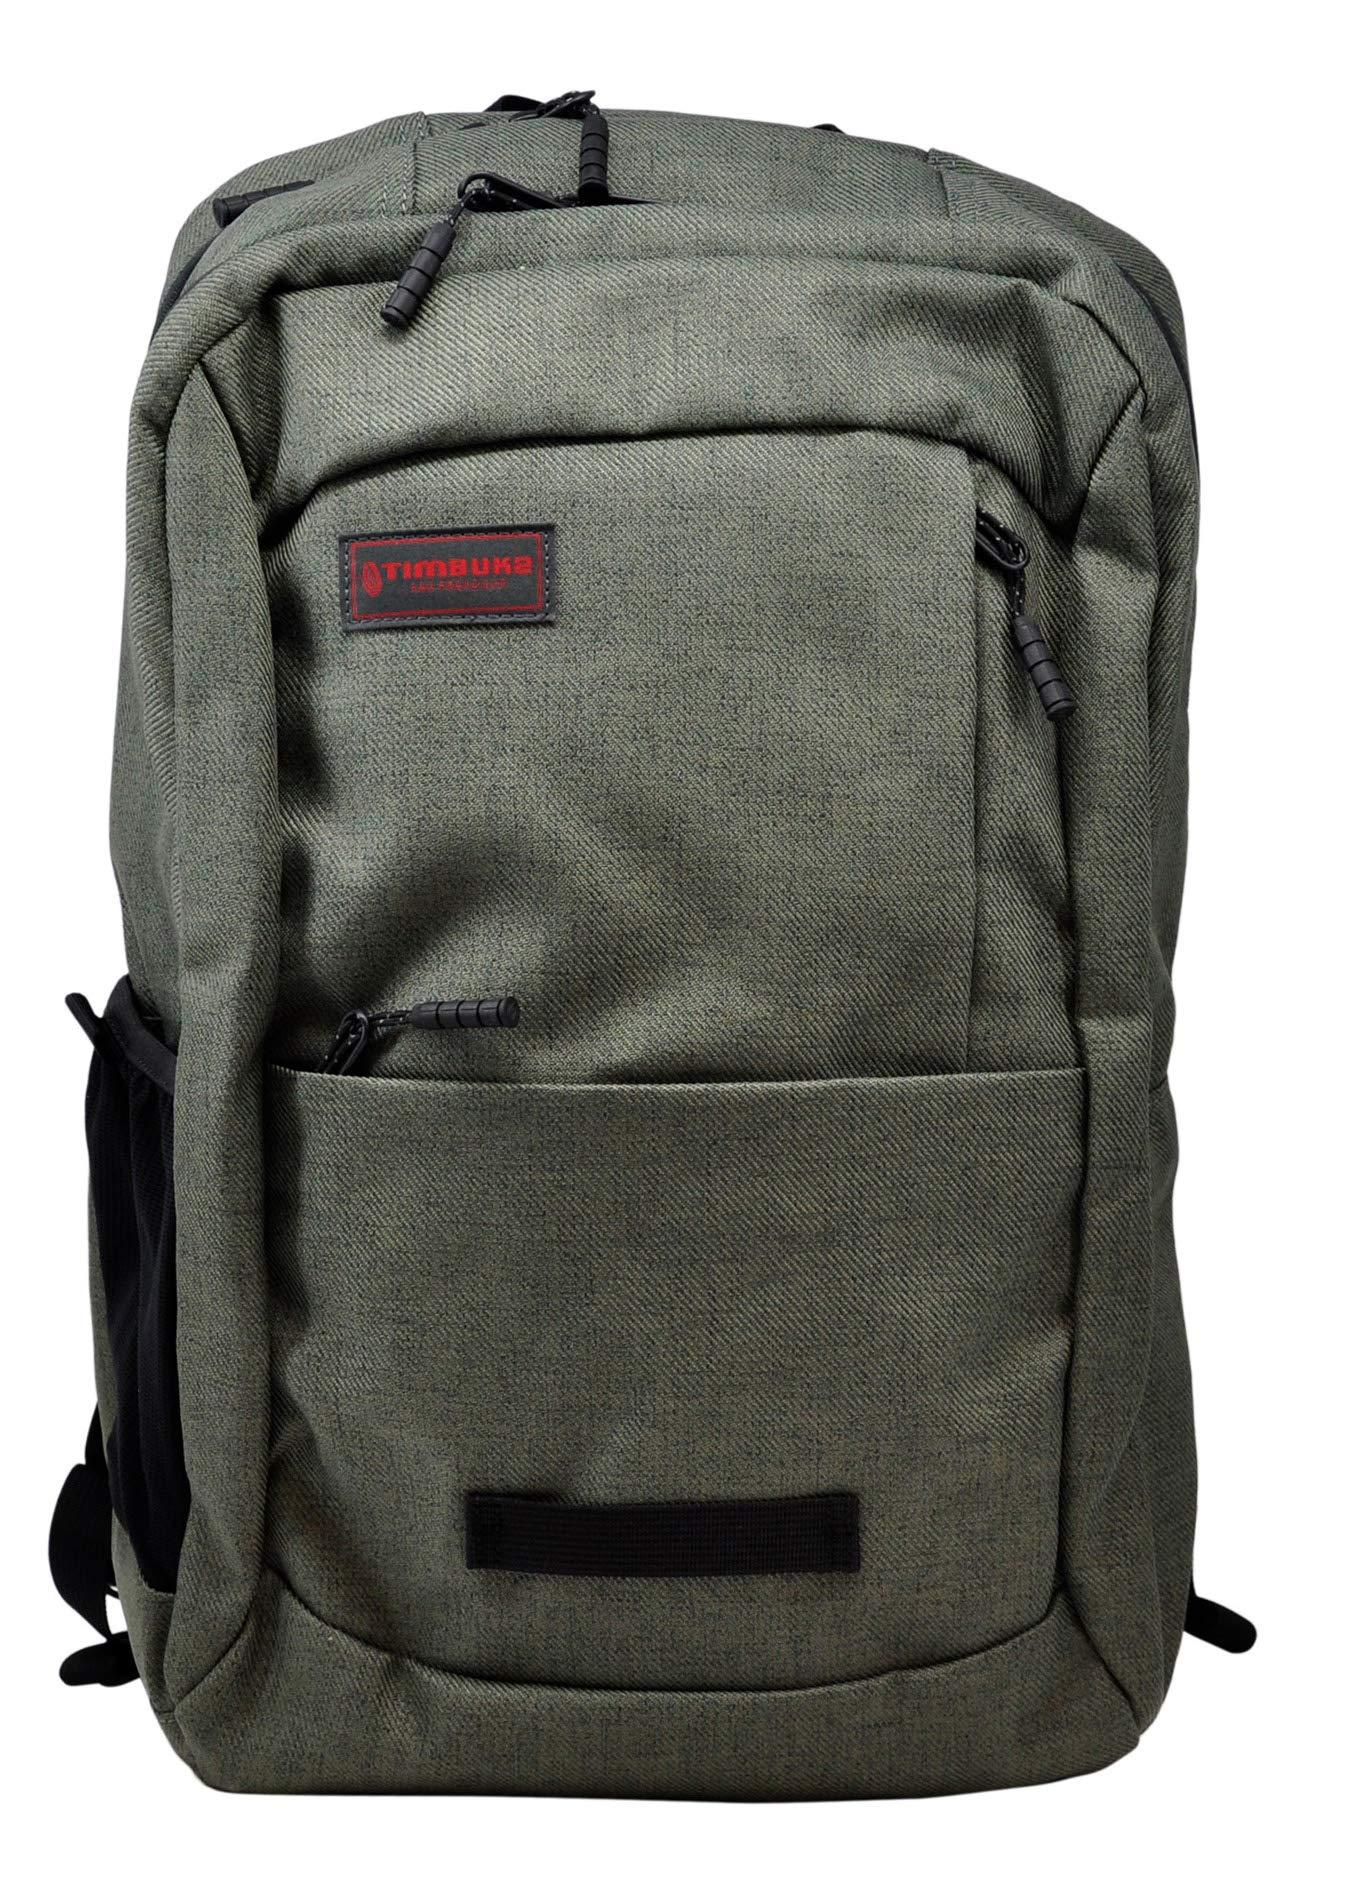 Timbuk2 Parkside Laptop Backpack (Concrete)